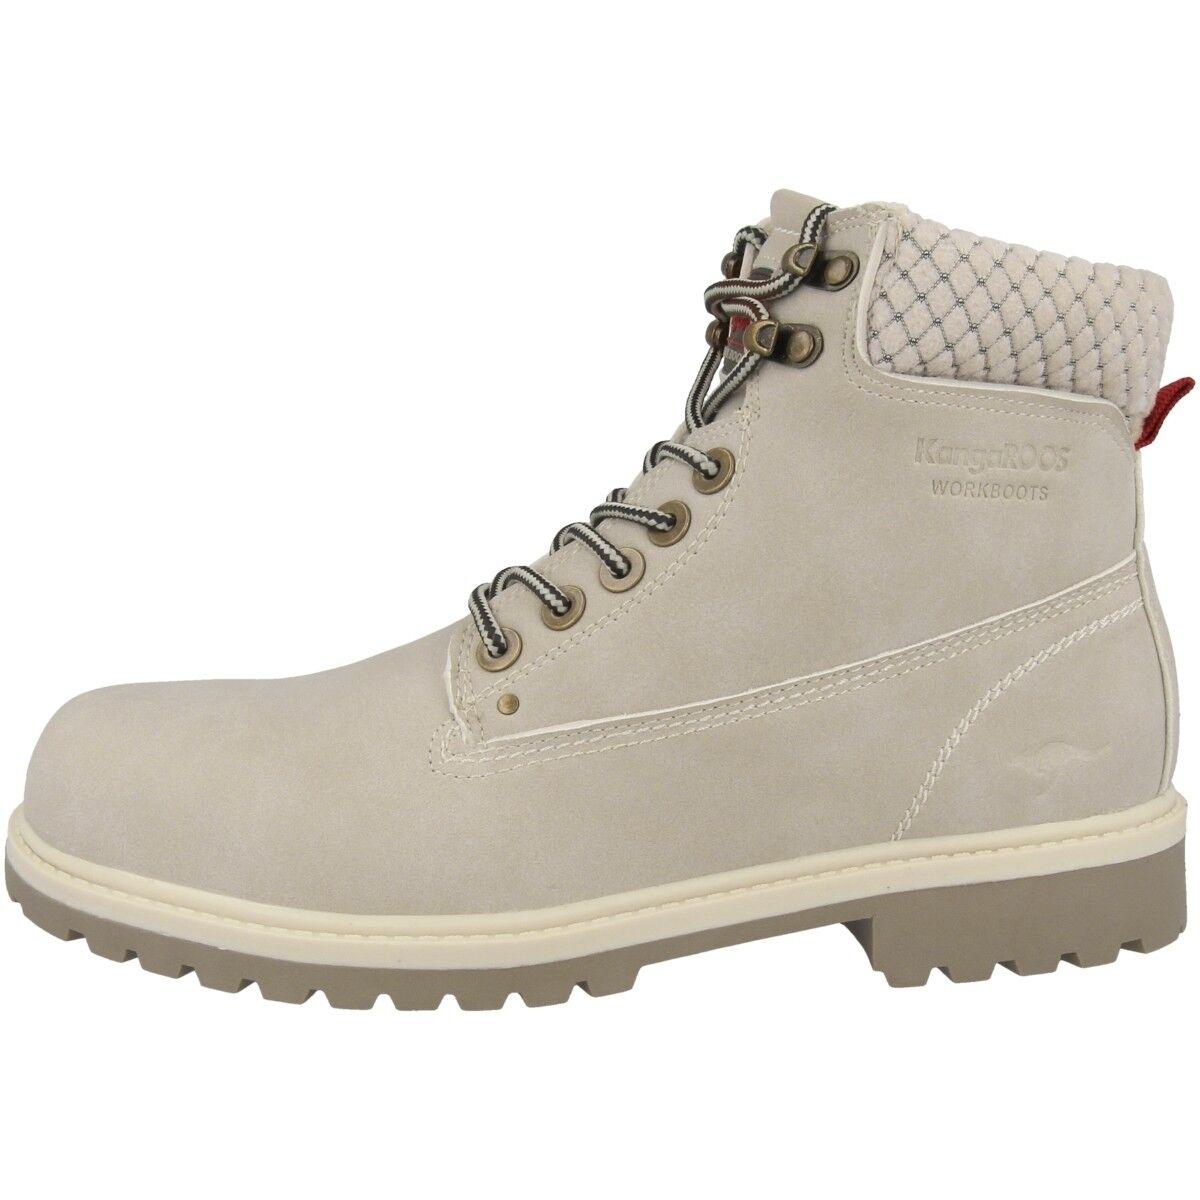 KangaROOS Riveter W botas I  Zapatos  Damen botas W Stiefel off Blanco Kiwit Nowis 30540-010 7d0903